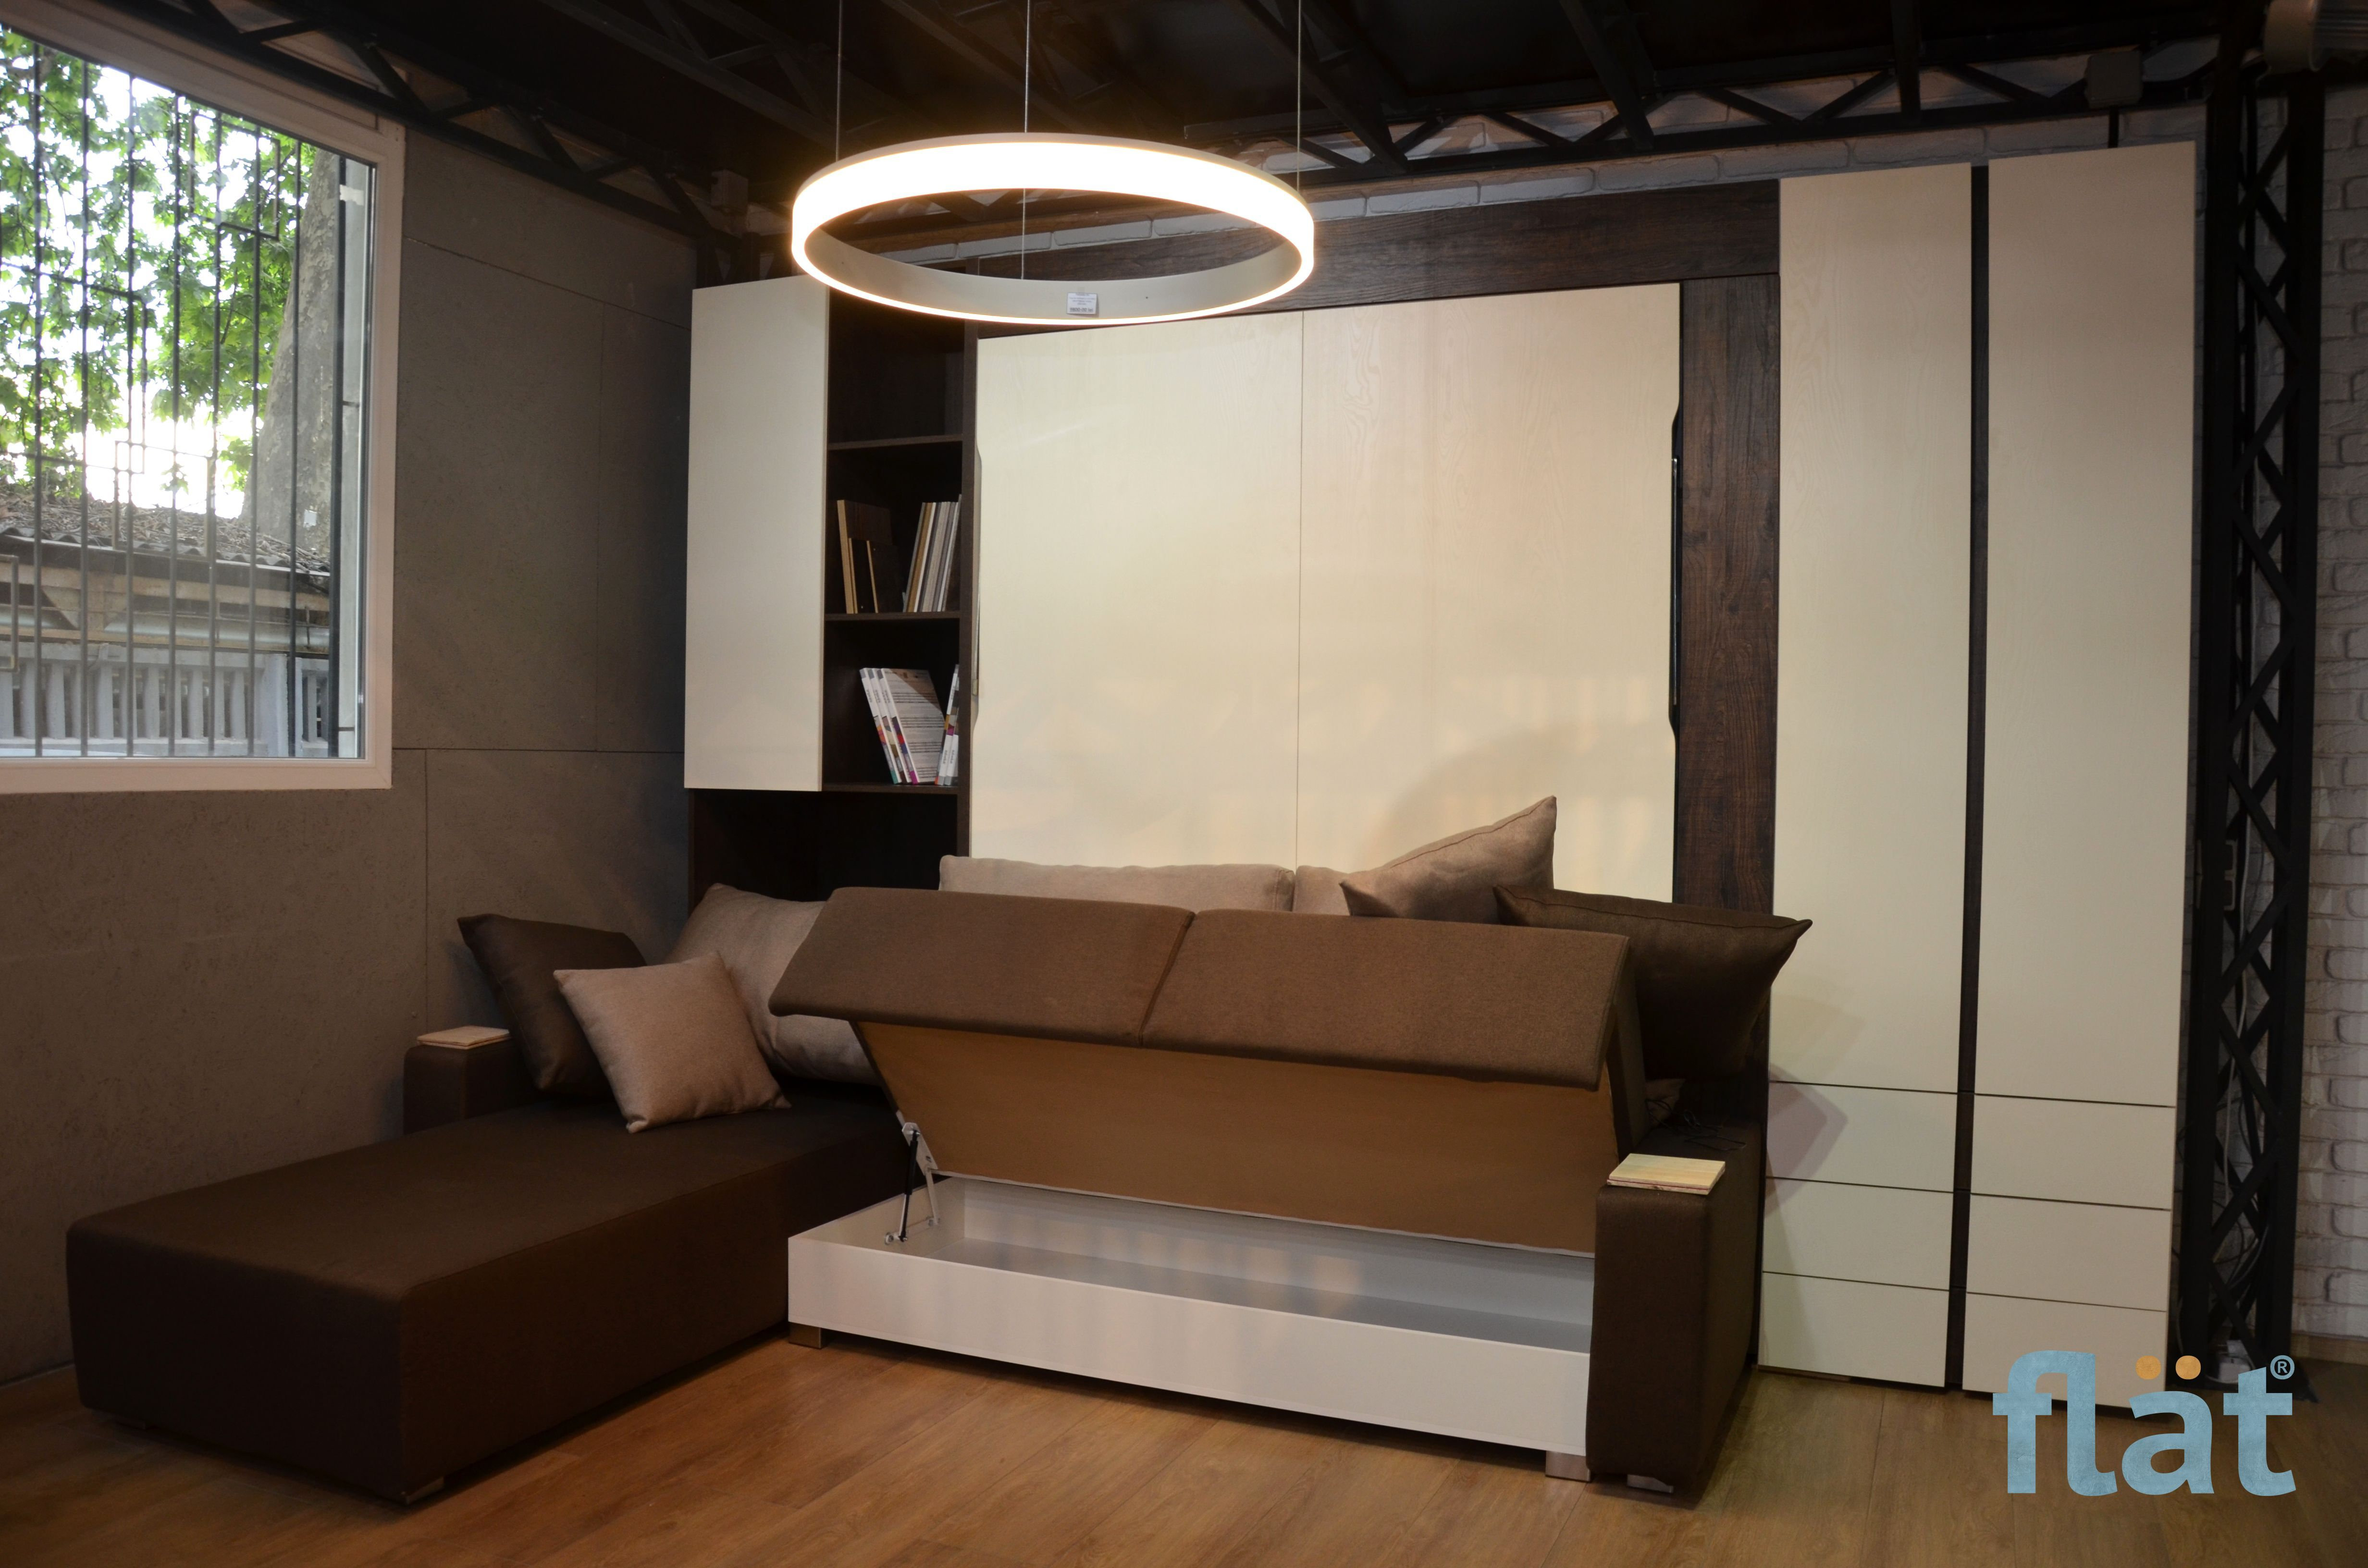 Double size wall bed with corner sofa. Шкаф кровать. Сет